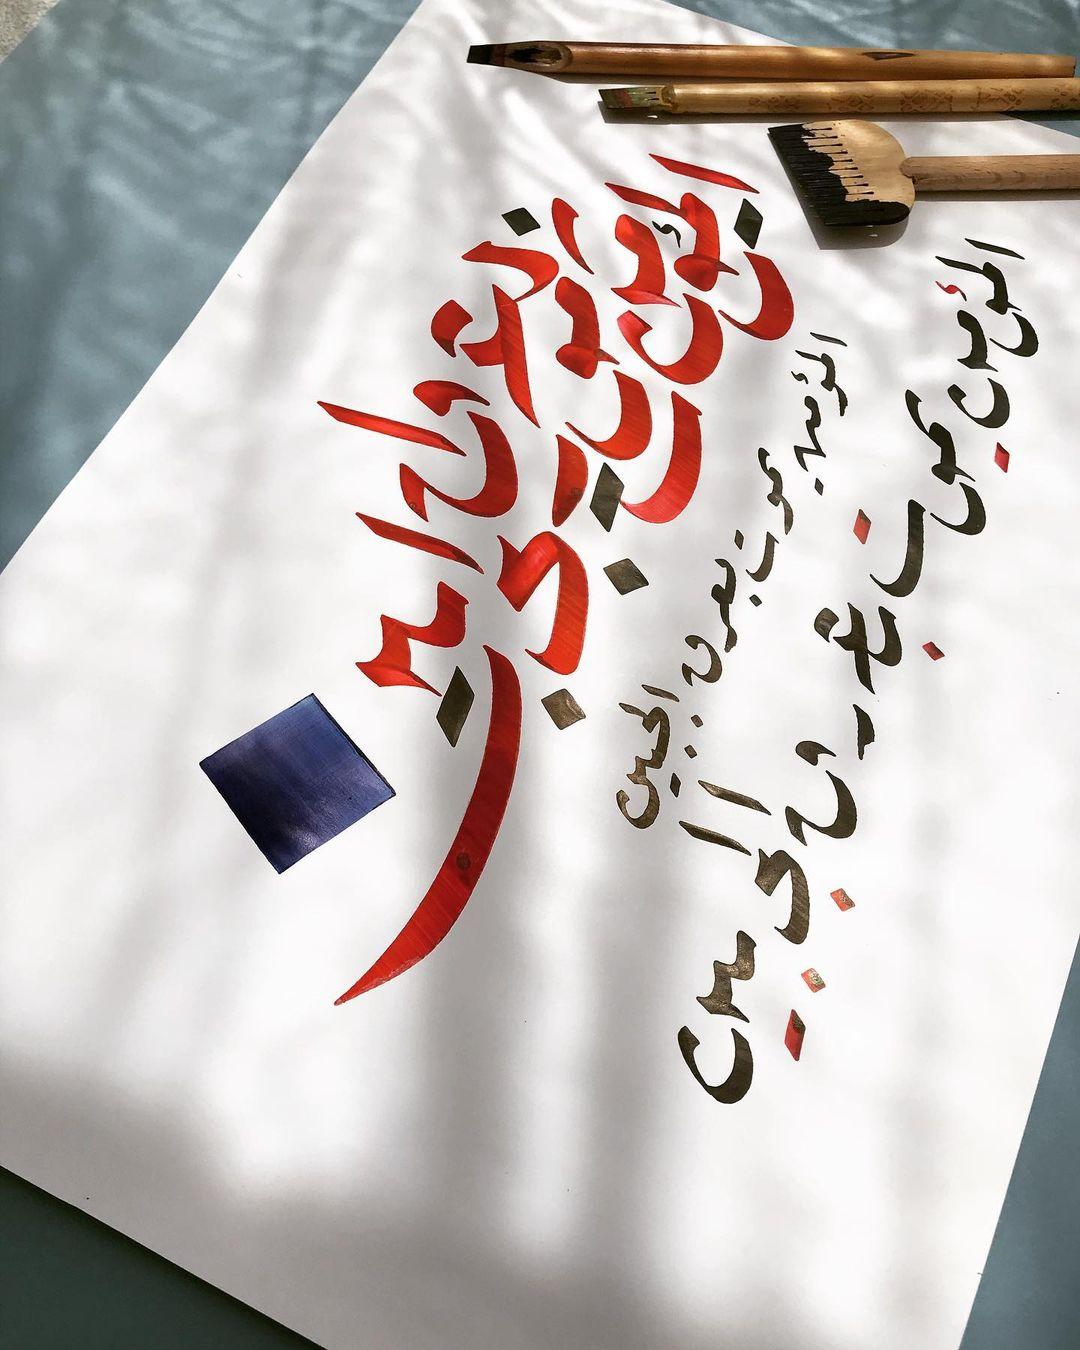 Donwload Photo المؤمن يموت بعرق الجبين #typografi #lettering #hüsnihat #kaligrafi #فن #فنون #خ...- hattat_aa 1